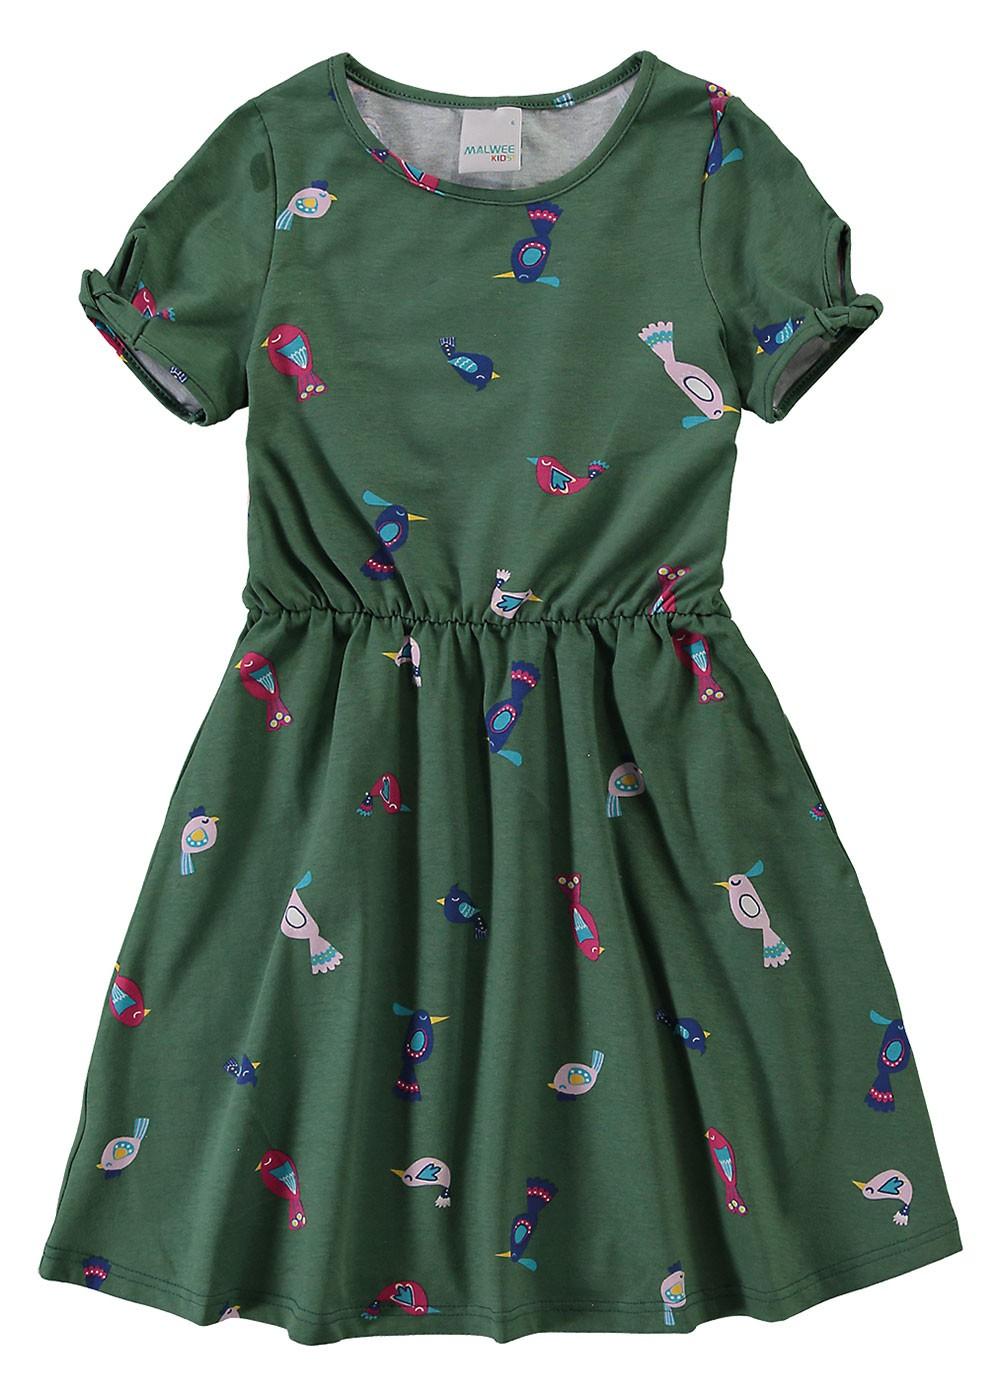 Vestido Infantil Verão Verde Birds Malwee